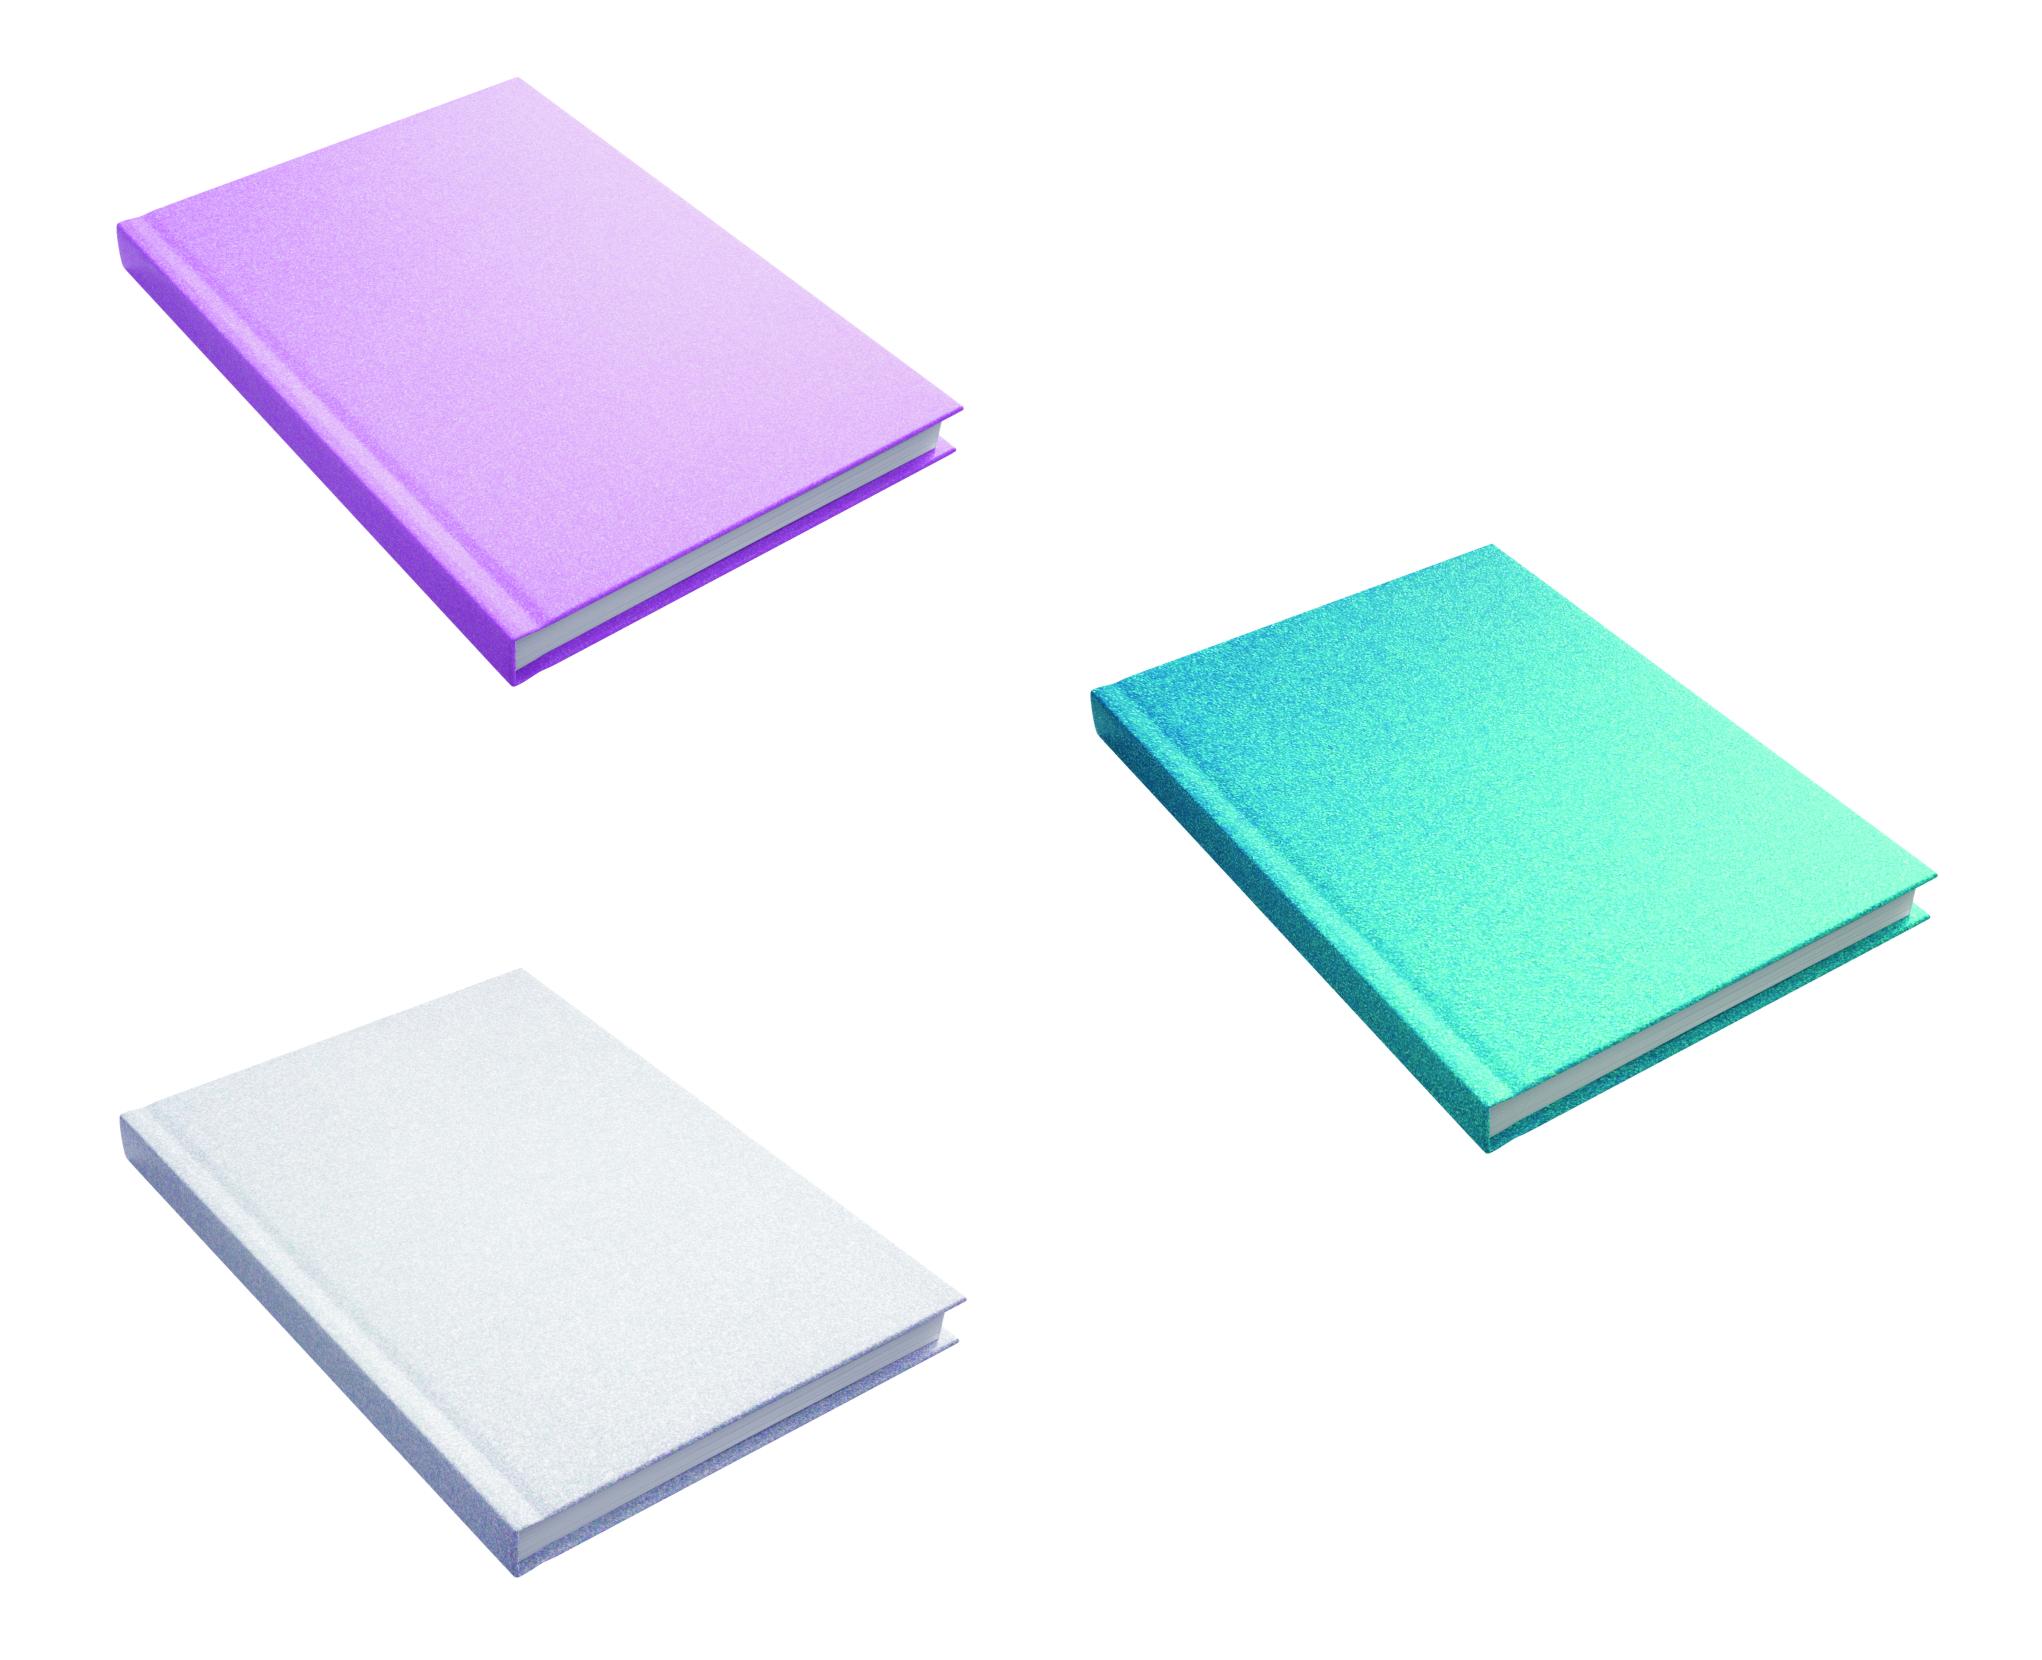 3er Set Kladden - Notizbuch - DIN A5 - 80 Blatt - 80g/m² - kariert - mit Glittercover - 3 Farben - s